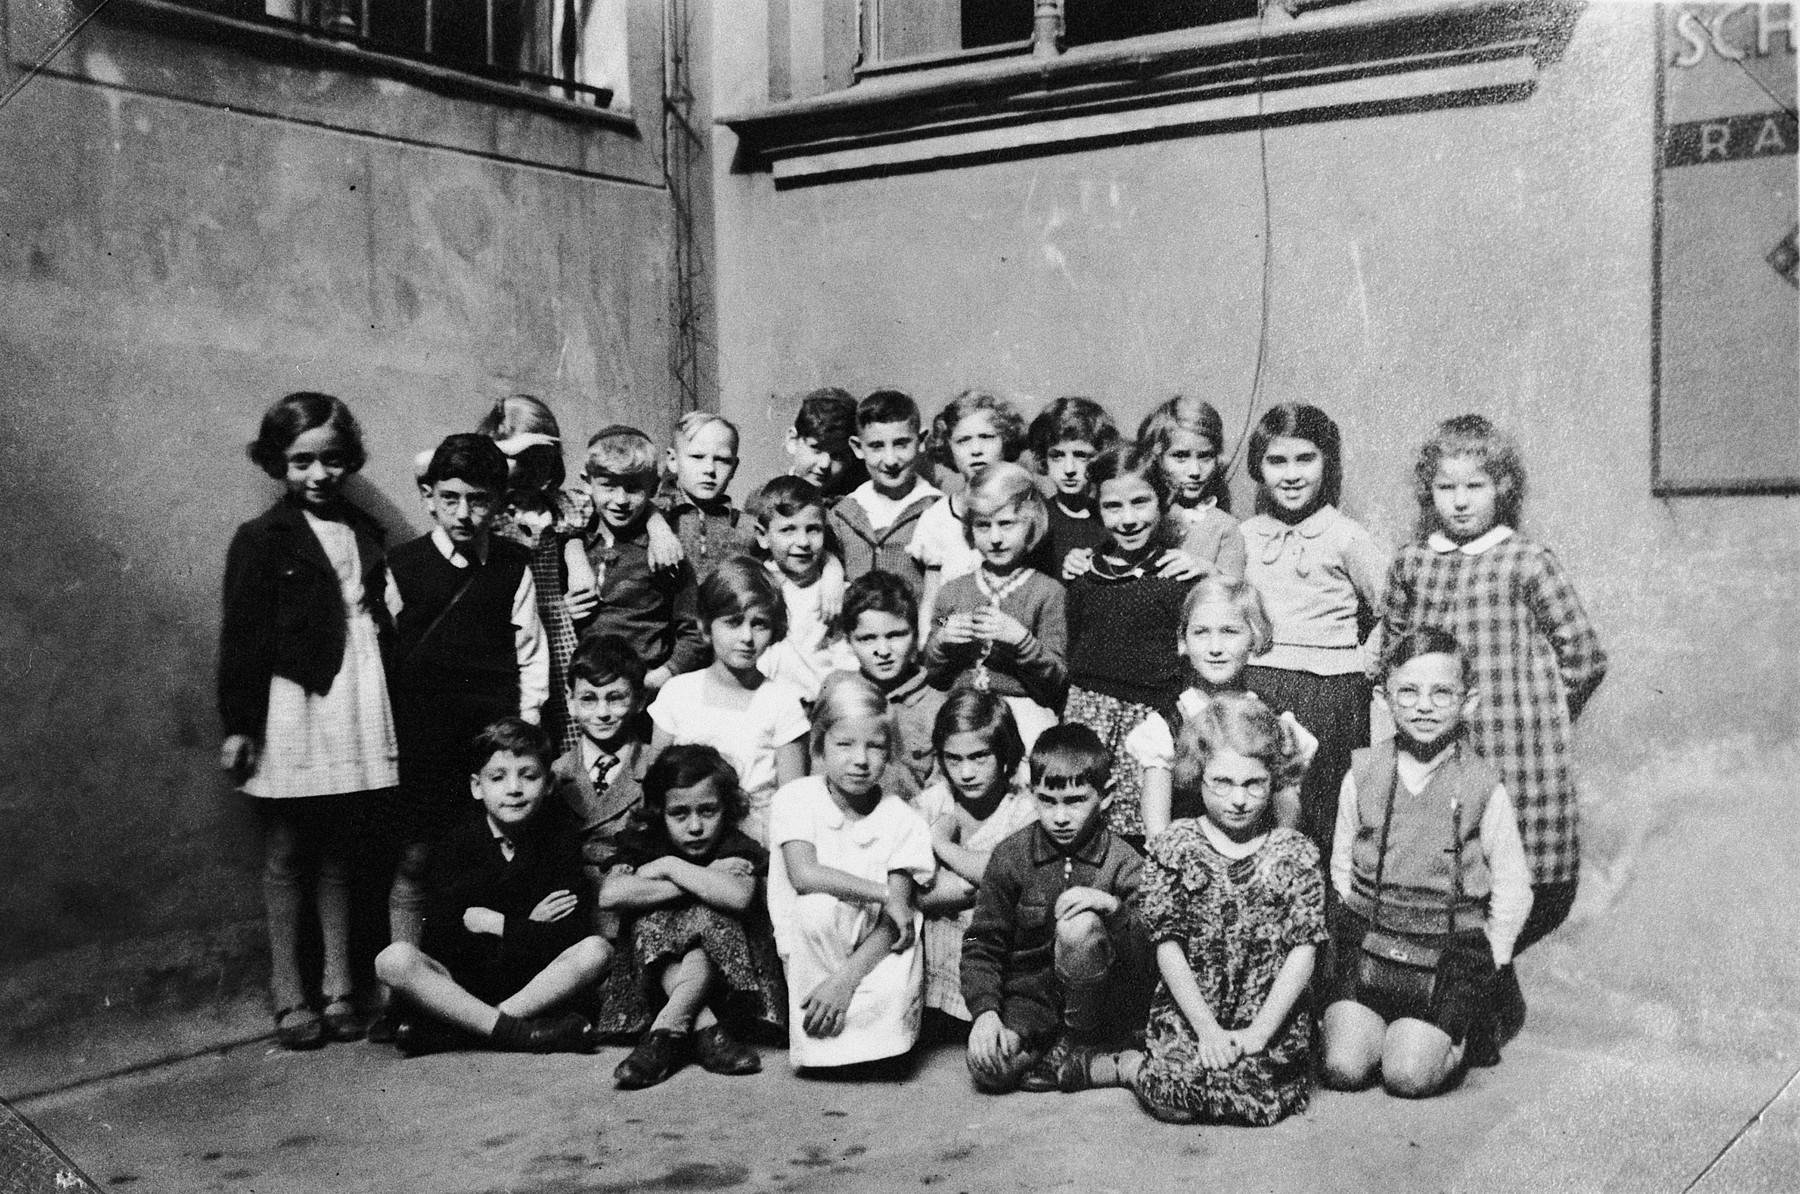 Group portrait of children in the Juedische Folshule in Stettin.